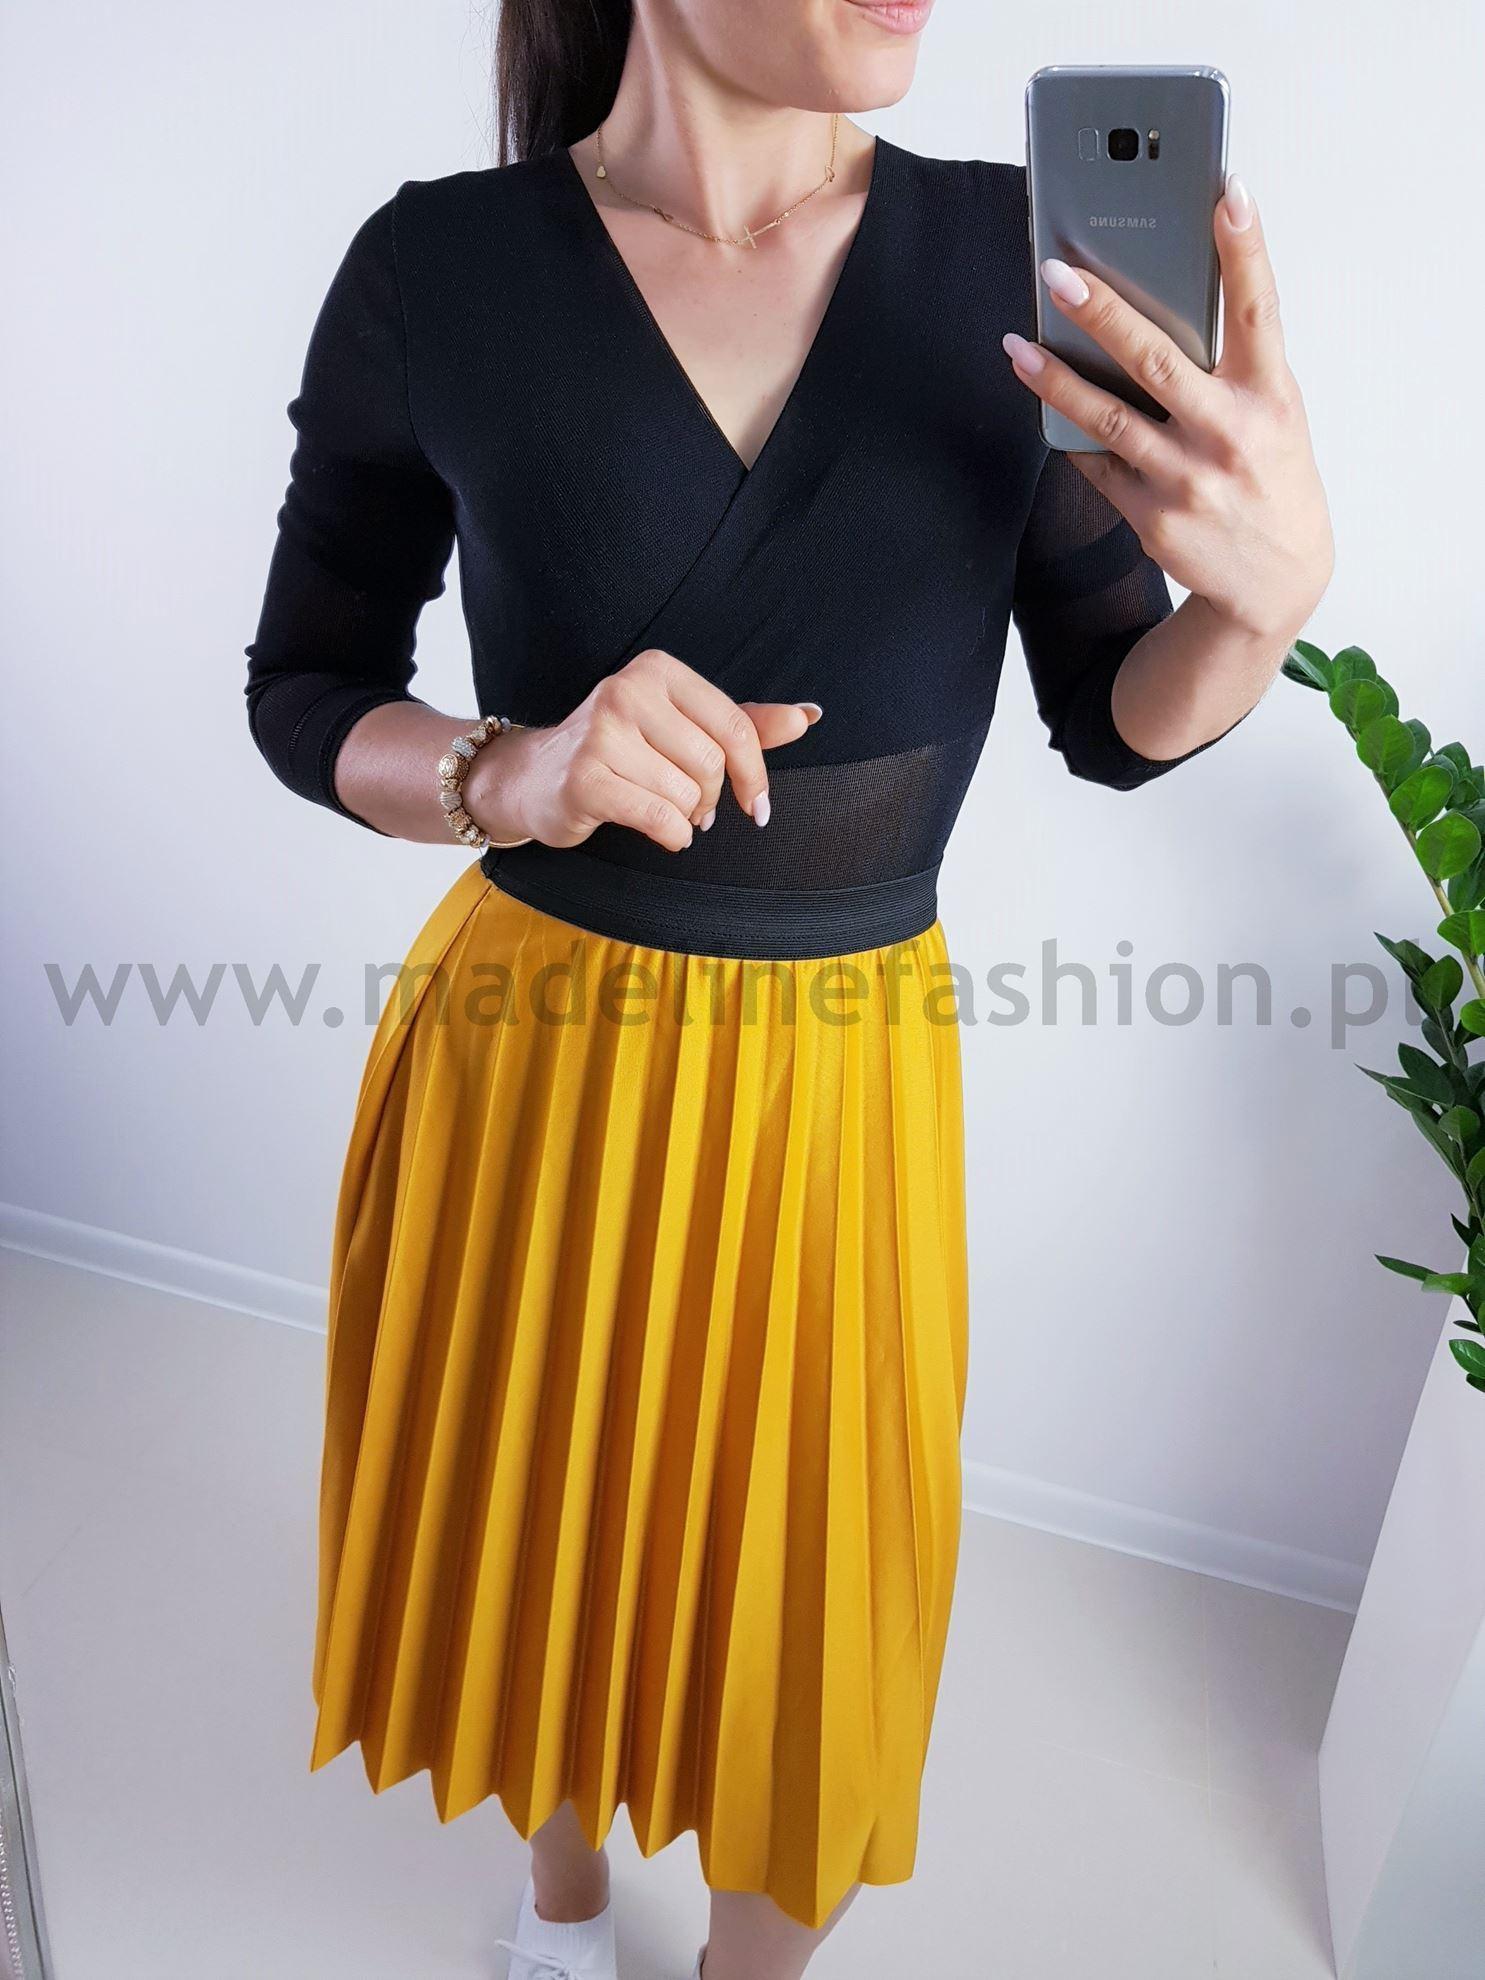 products 0003905 spodnica plisowana midi musztardowa 1